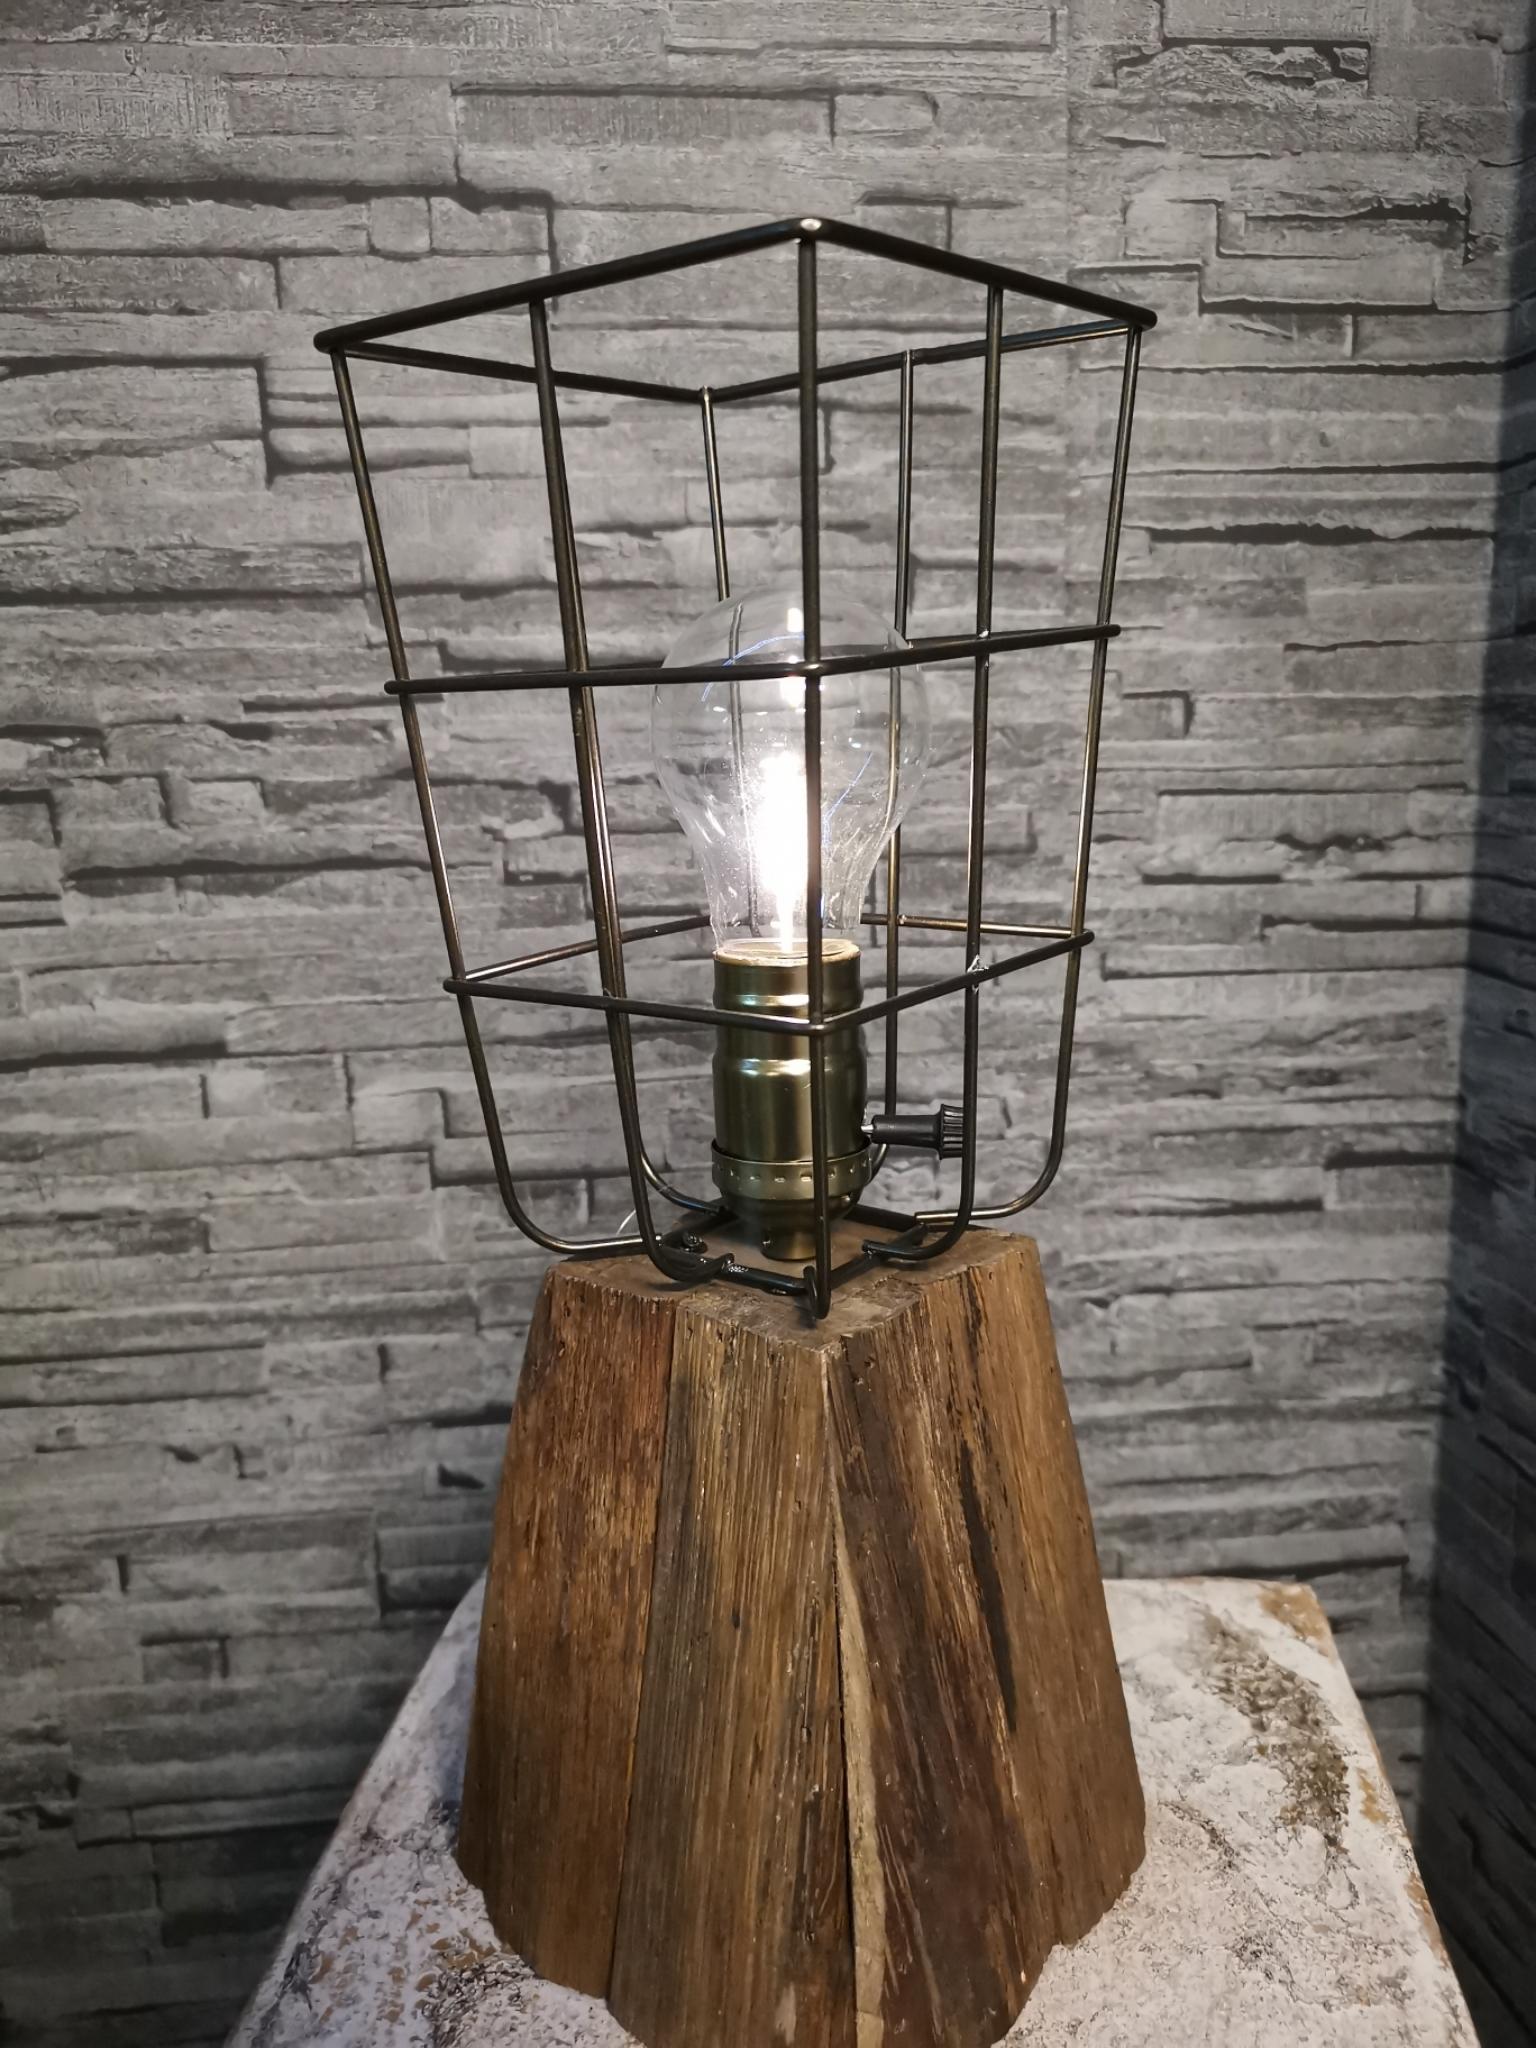 LED kooilamp op batterijen 01776